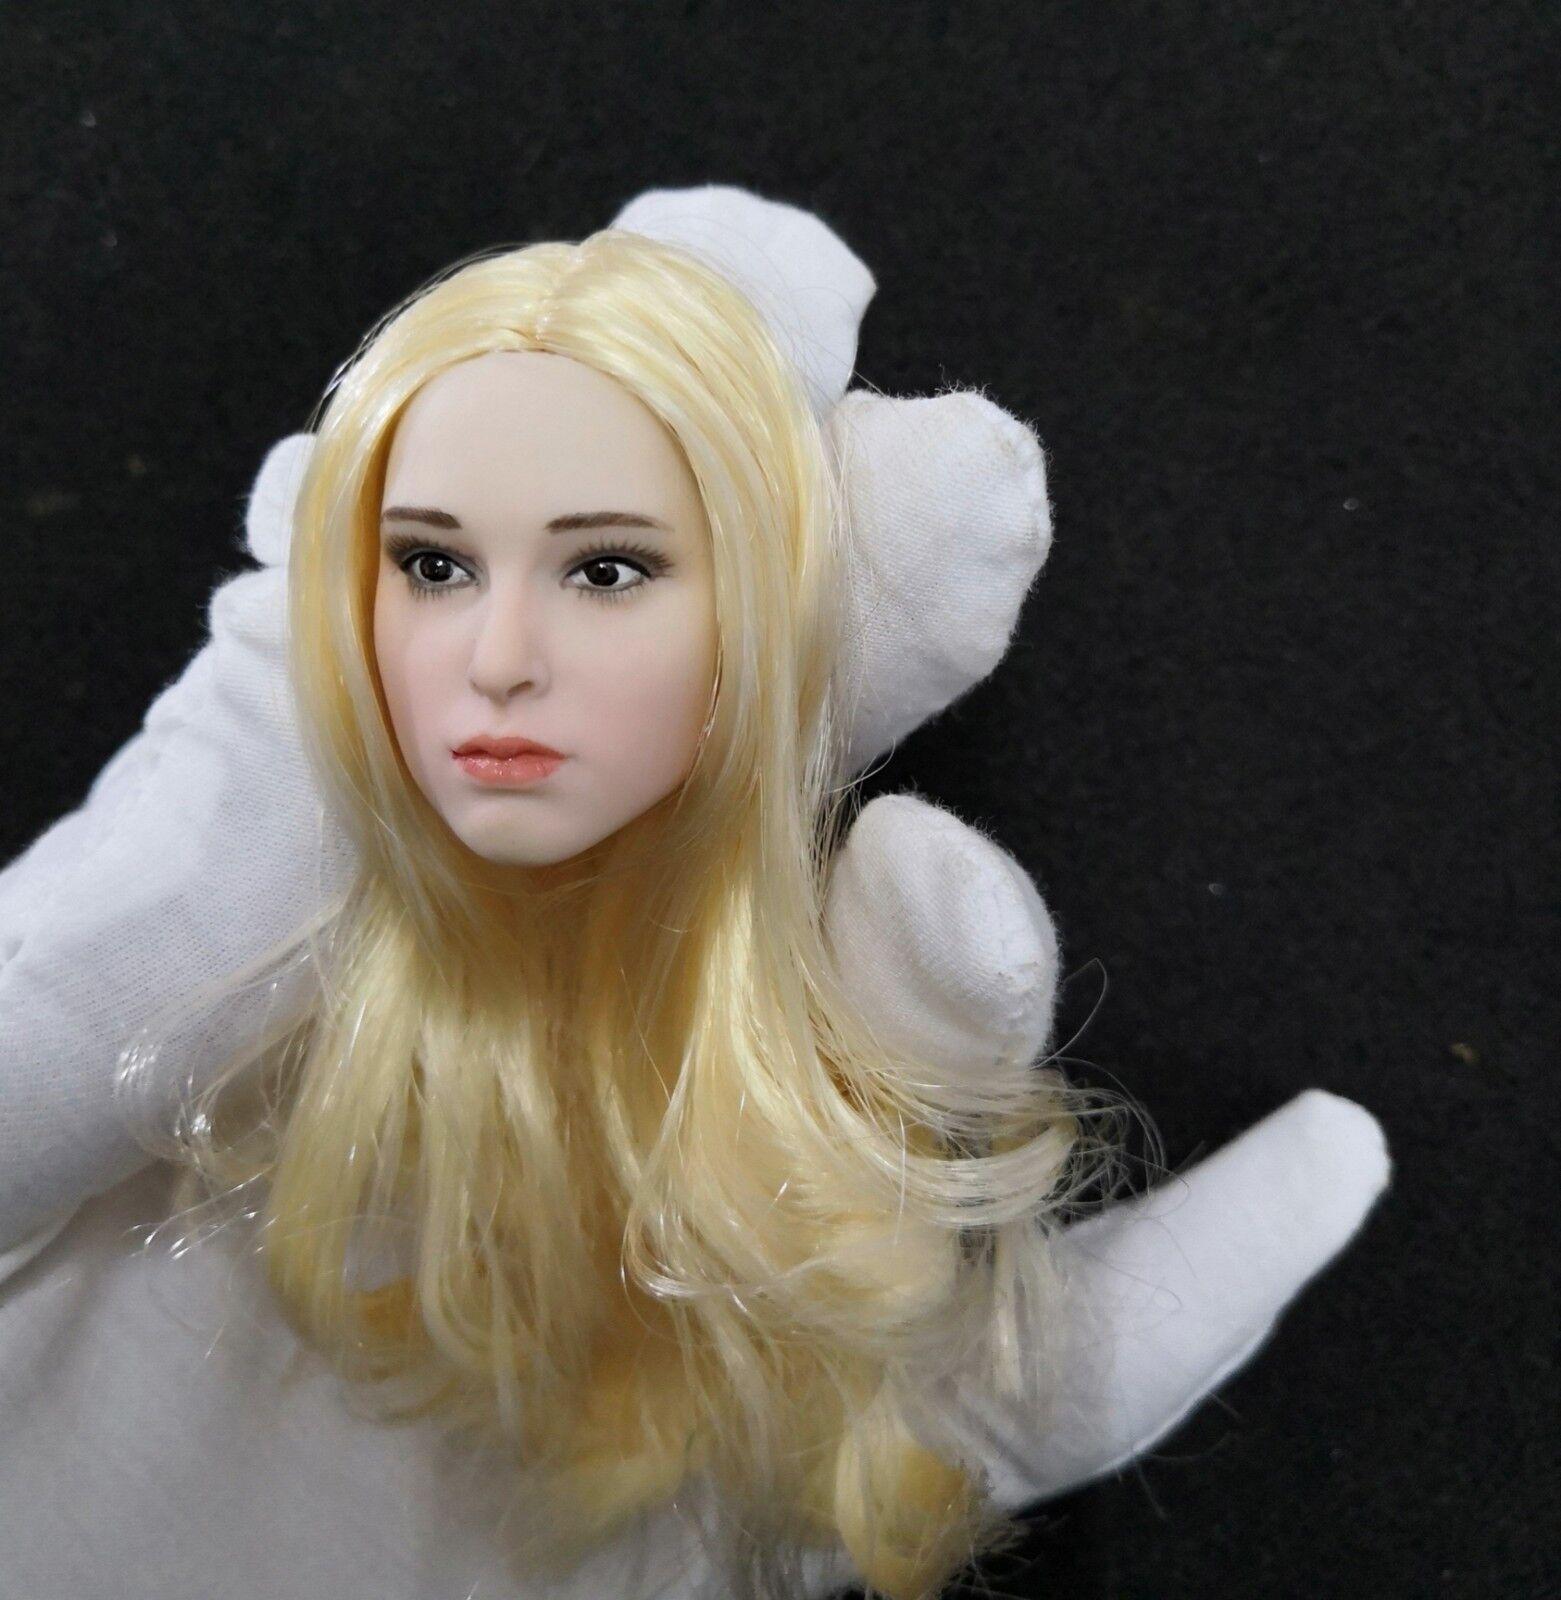 1   6 - skala natalie portman mädchen blond kopf carving - f 12  action - figur